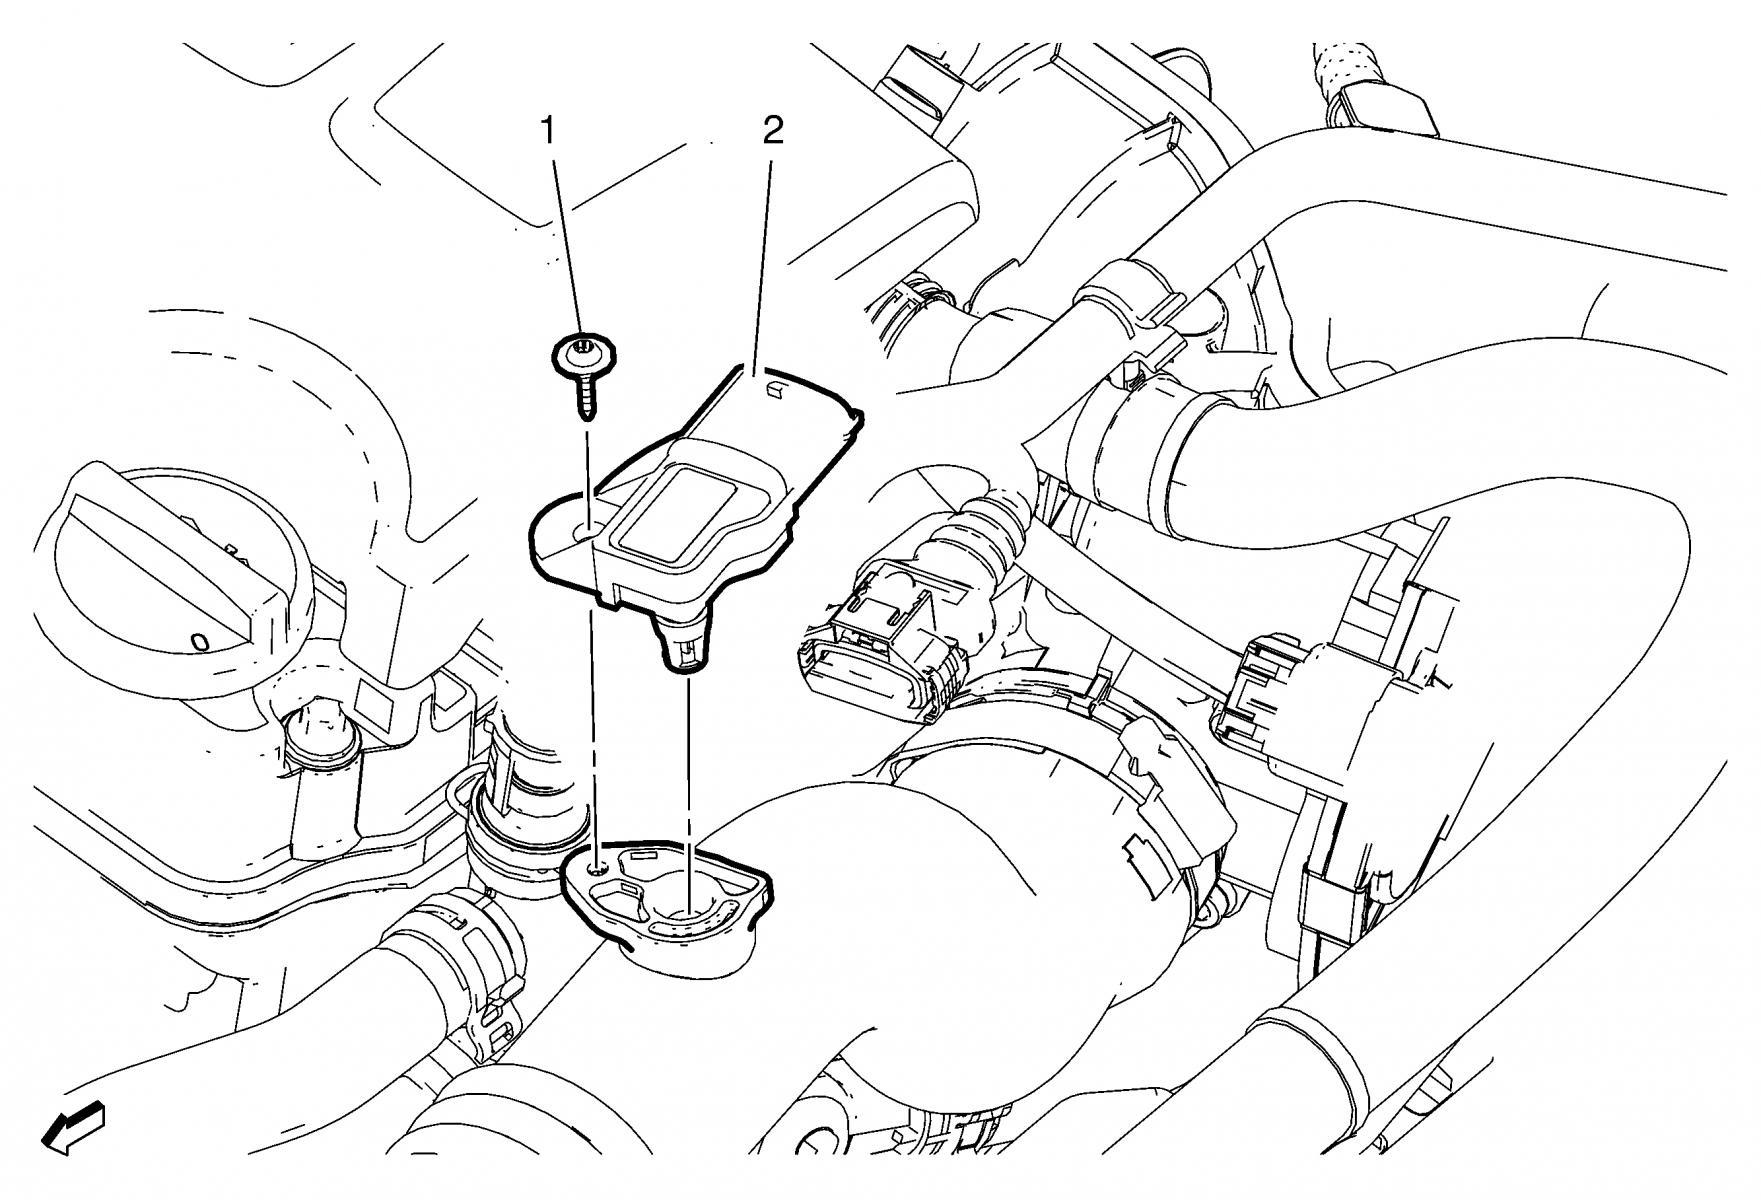 Zzp Intercooler Page 4 Toyota Rav4 Fuse Box Location Iat